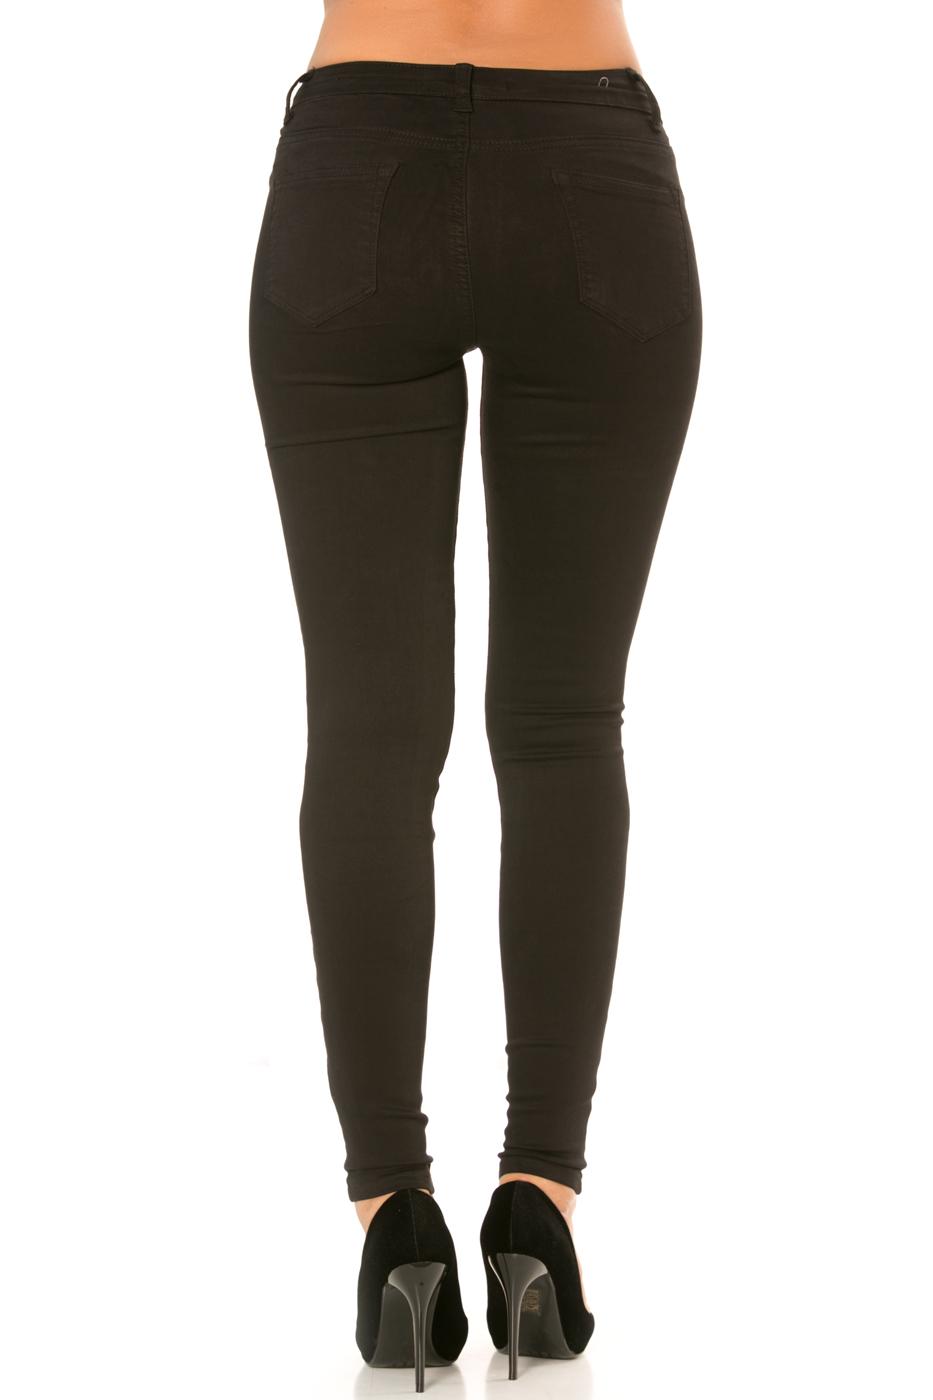 Nina Carter Pantalon noir skinny taille haute super stretch